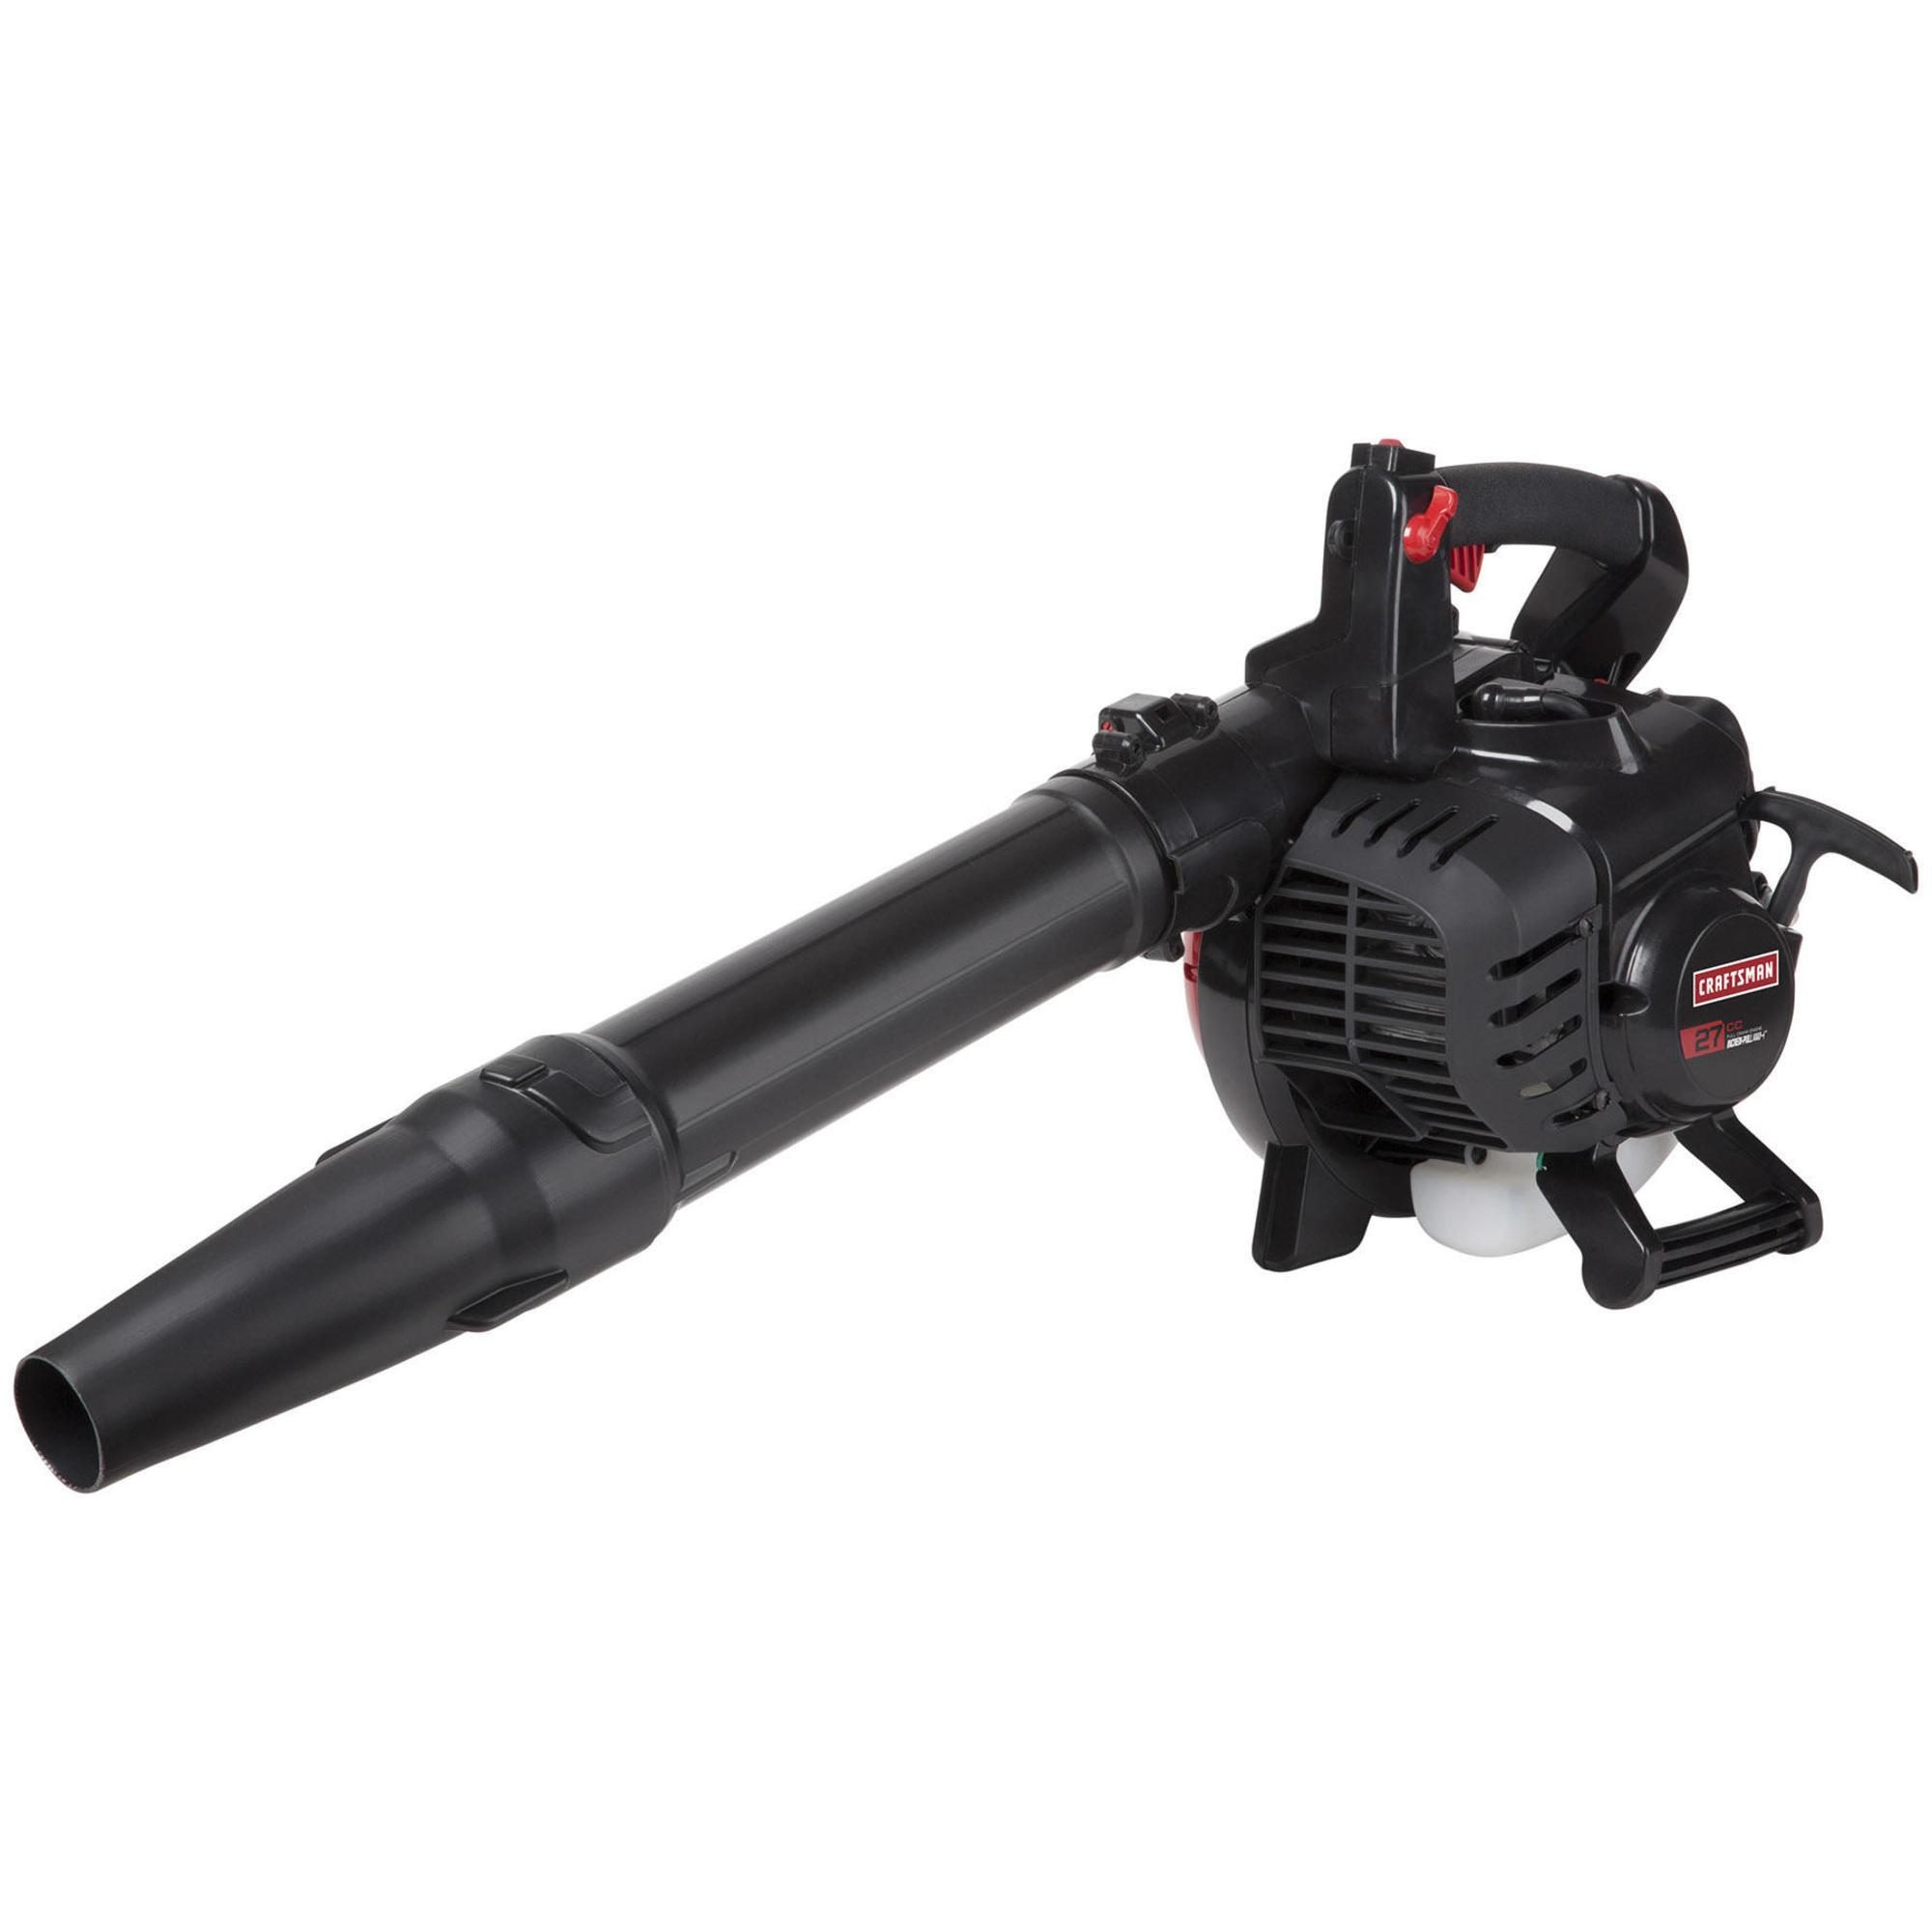 Image of Craftsman 41BS2HBC799 27cc Gas Blower, Black